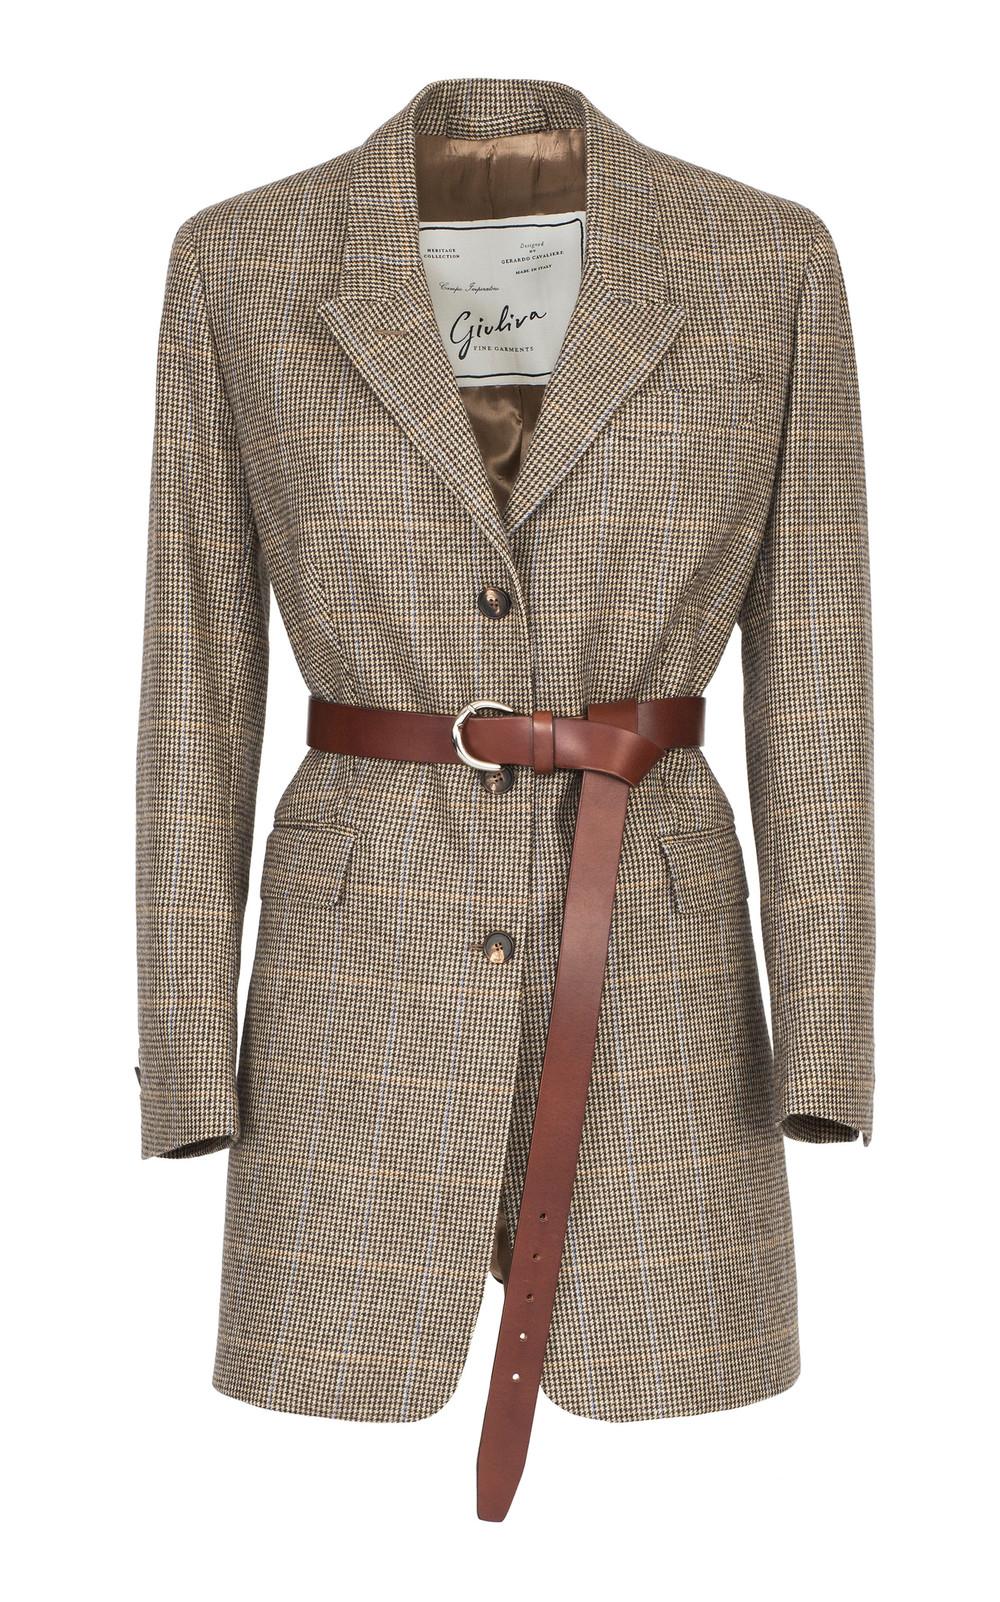 Giuliva Heritage Collection The Karen Jacket in brown